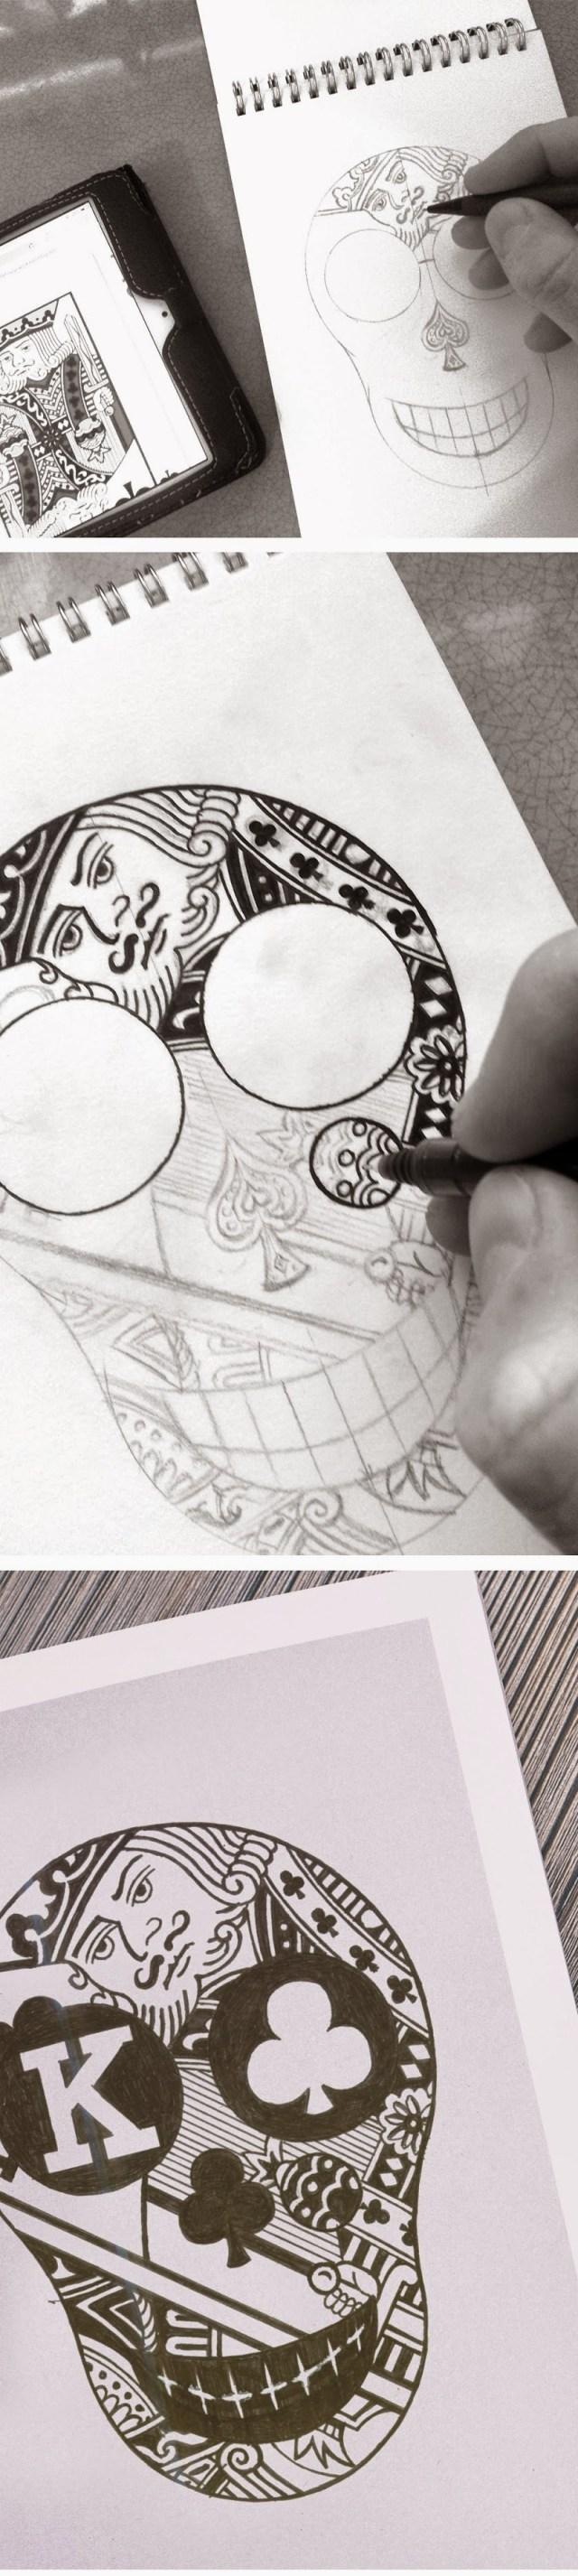 InkTober drawing by Matthew Price